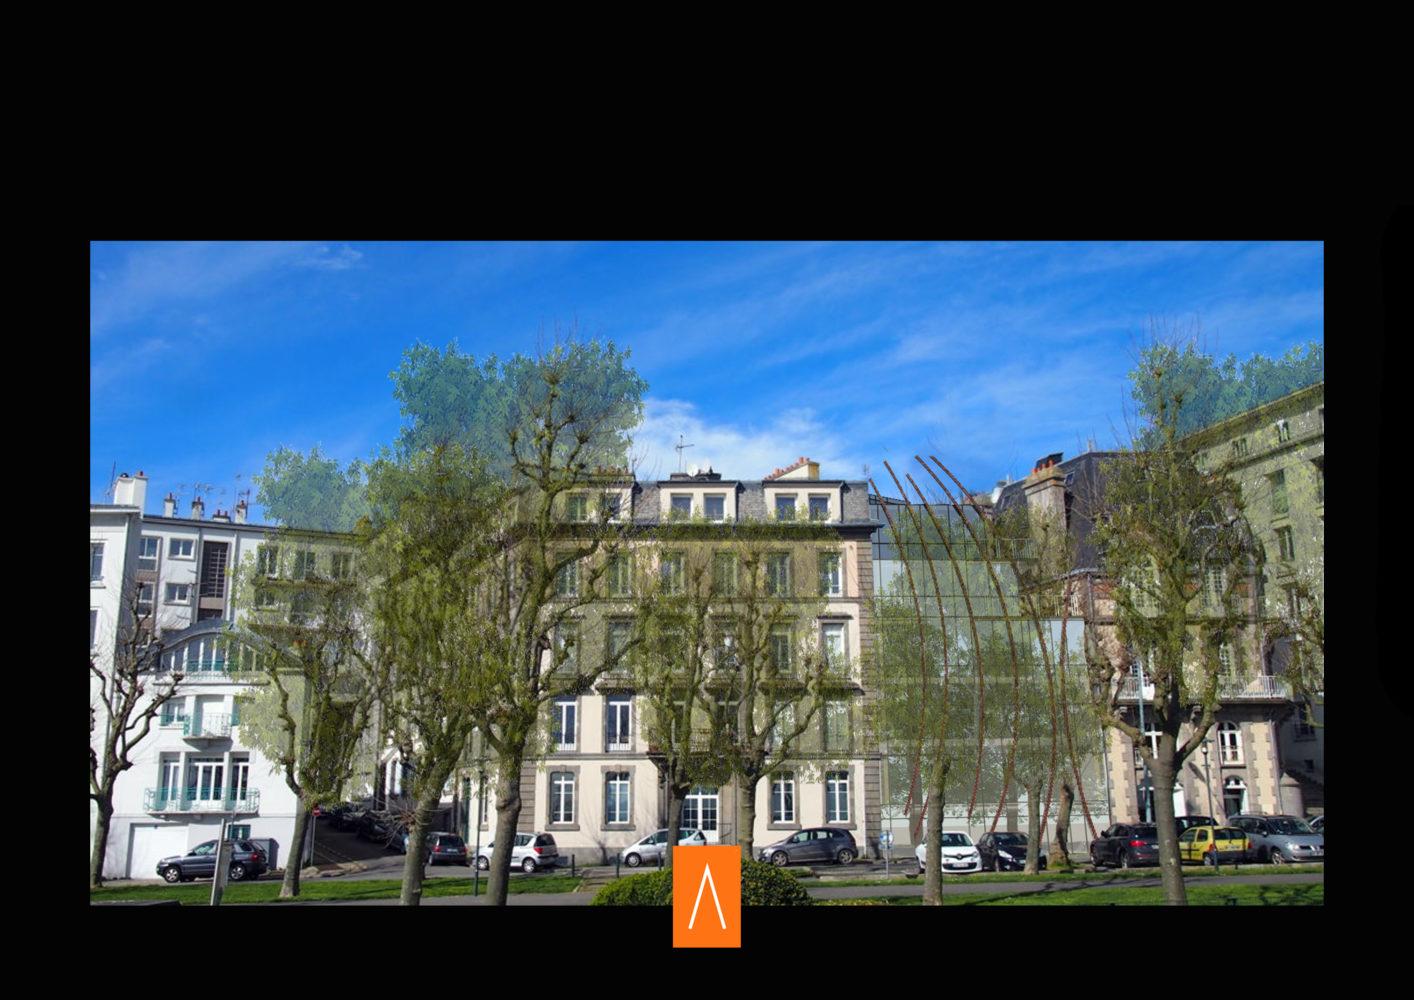 immeuble-mitoyen-cour-dajot-brest-1